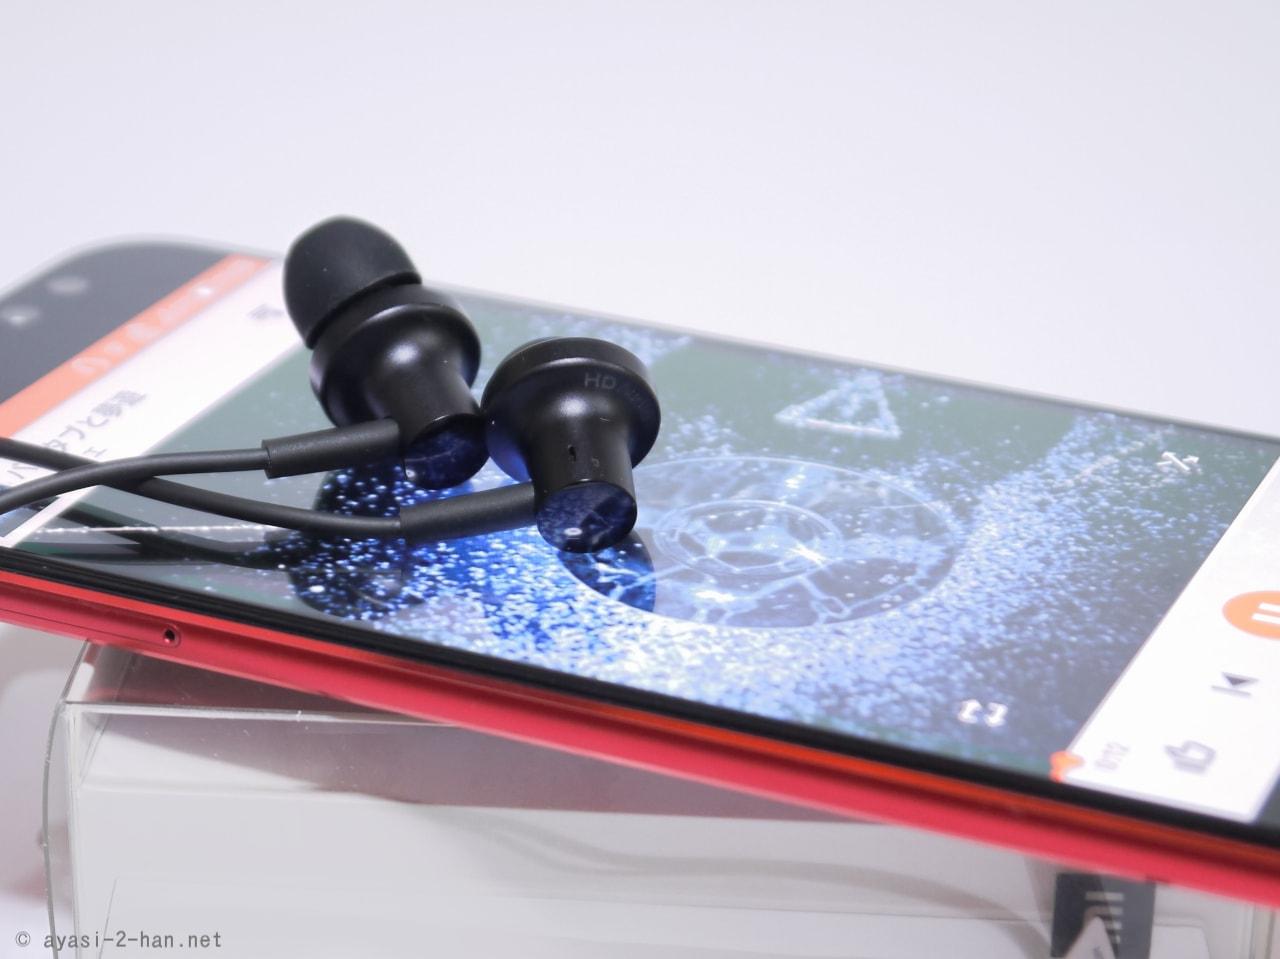 [PR]コスパ◎ 初めての人にもおすすめの中華イヤホン Xiaomi Hybrid Dual Drivers Earphonesの感想とか。